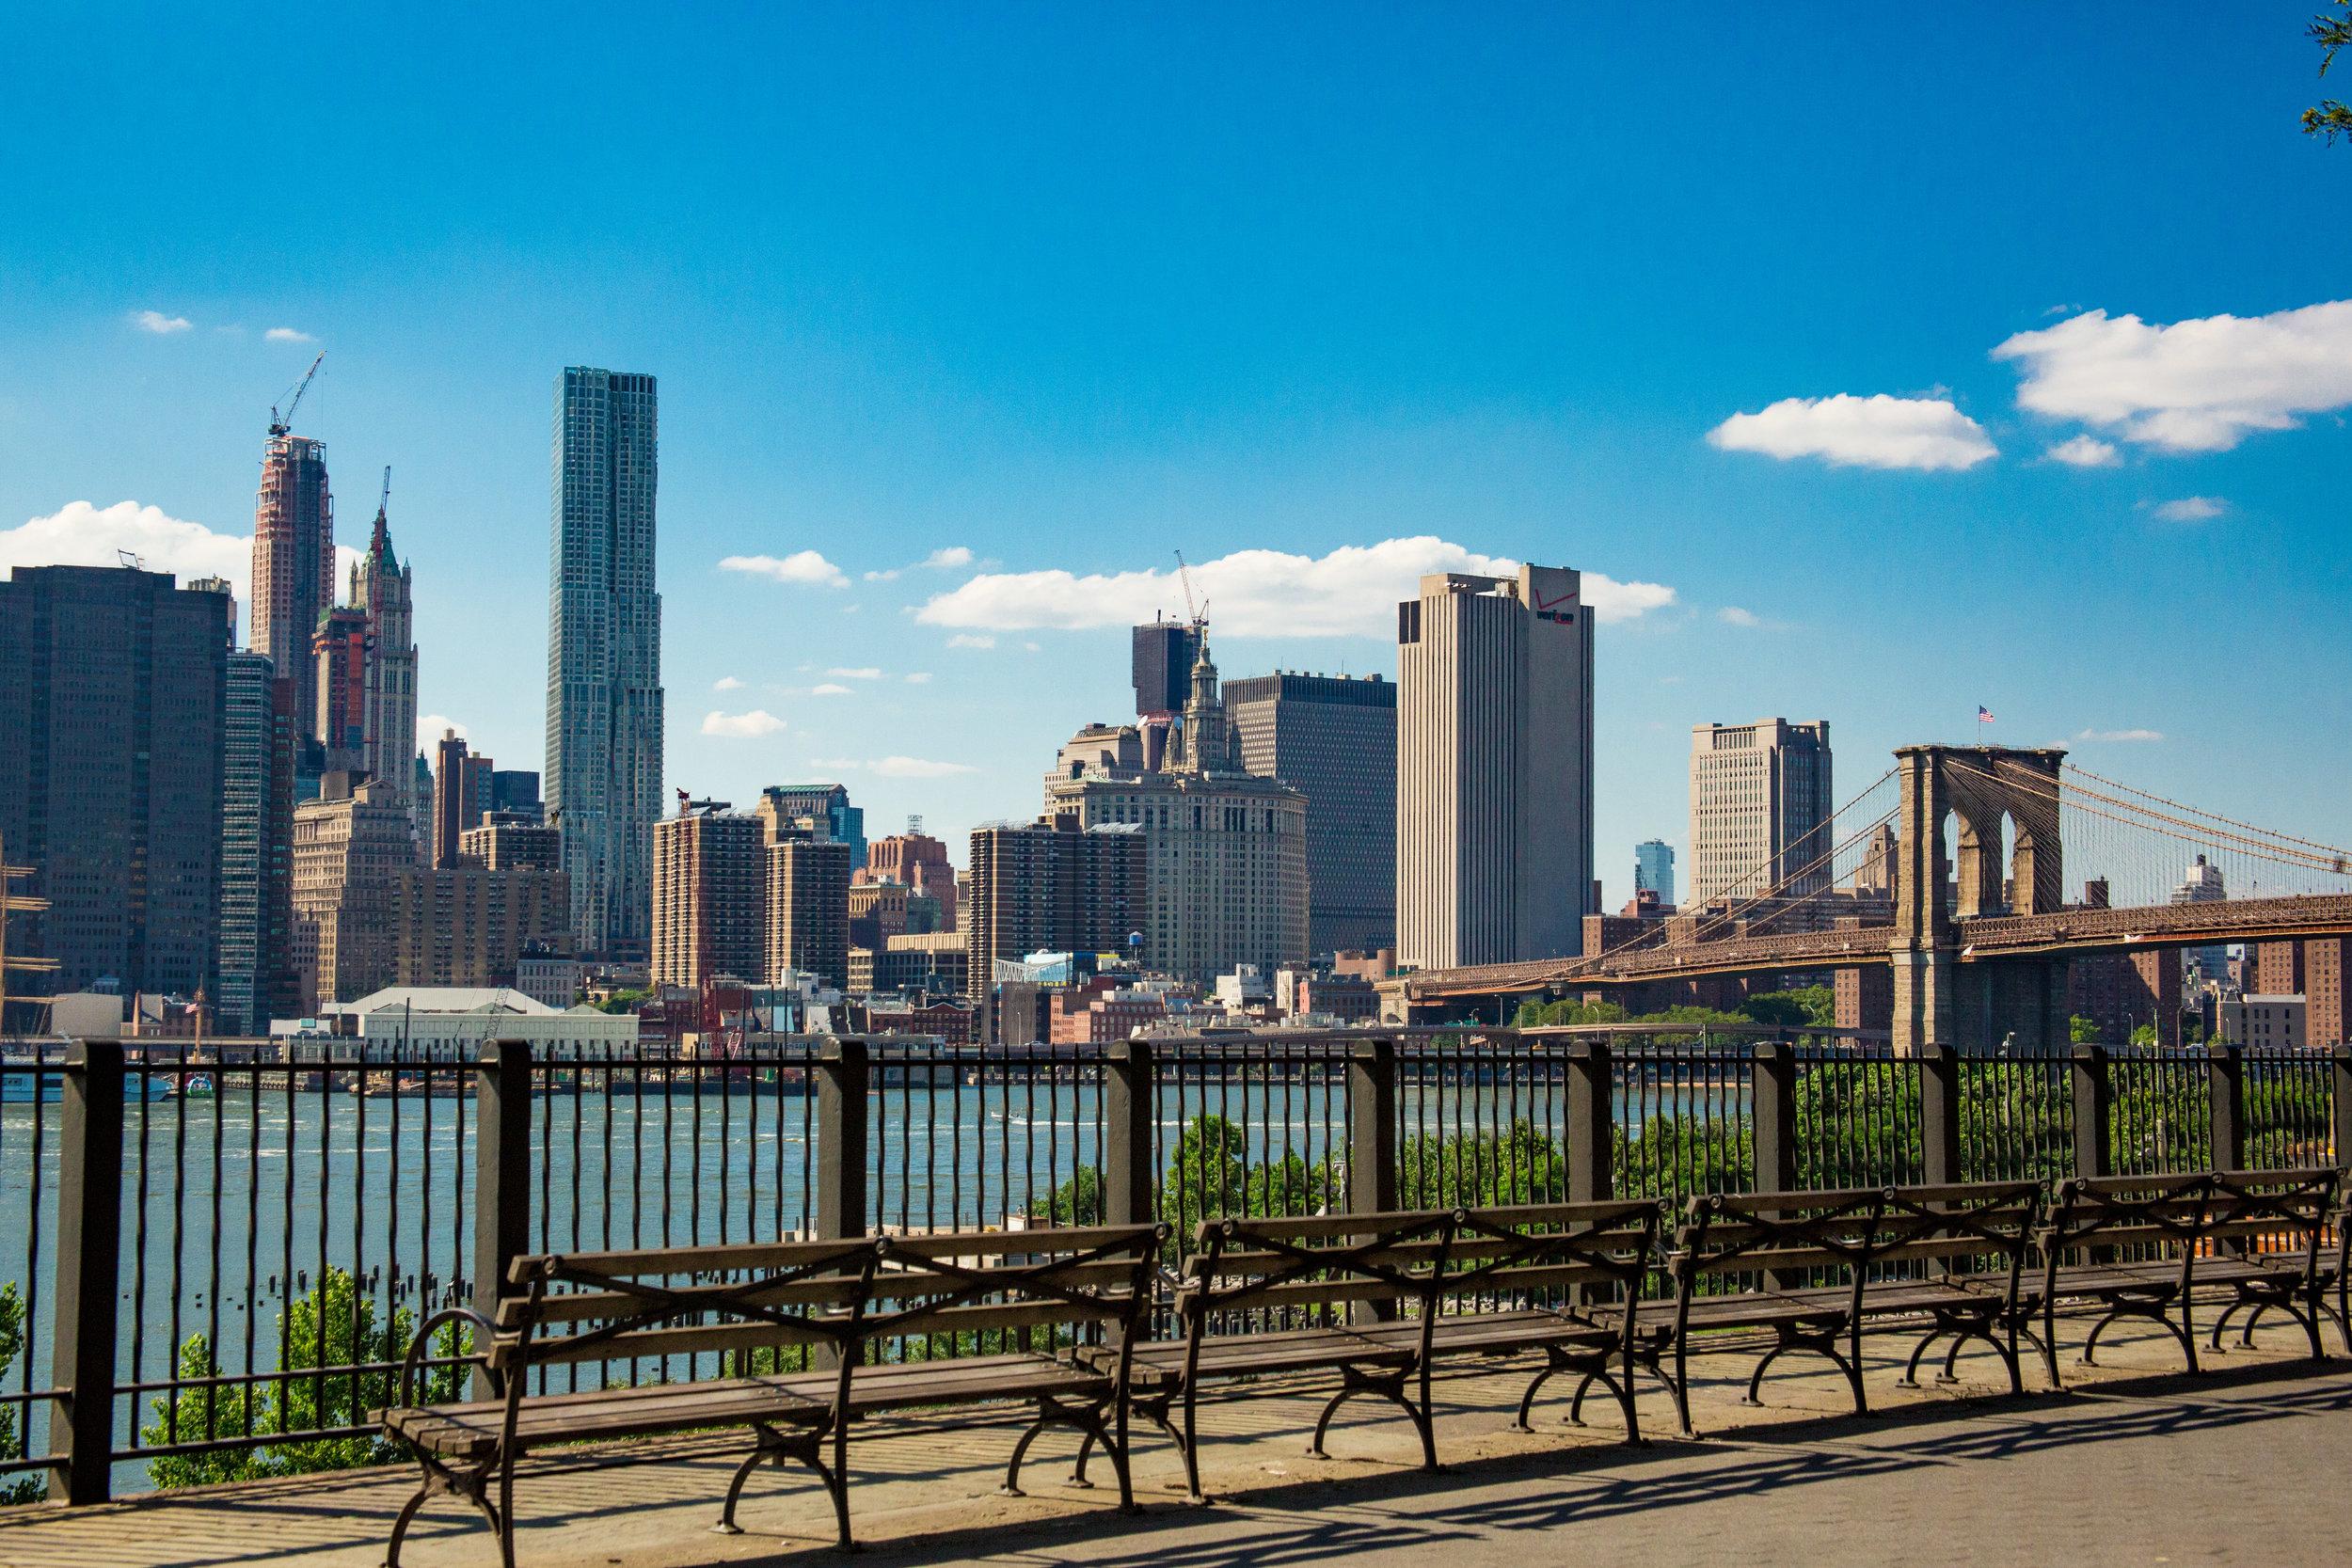 LSNY_Brooklyn_Bridge_Park-83.jpg